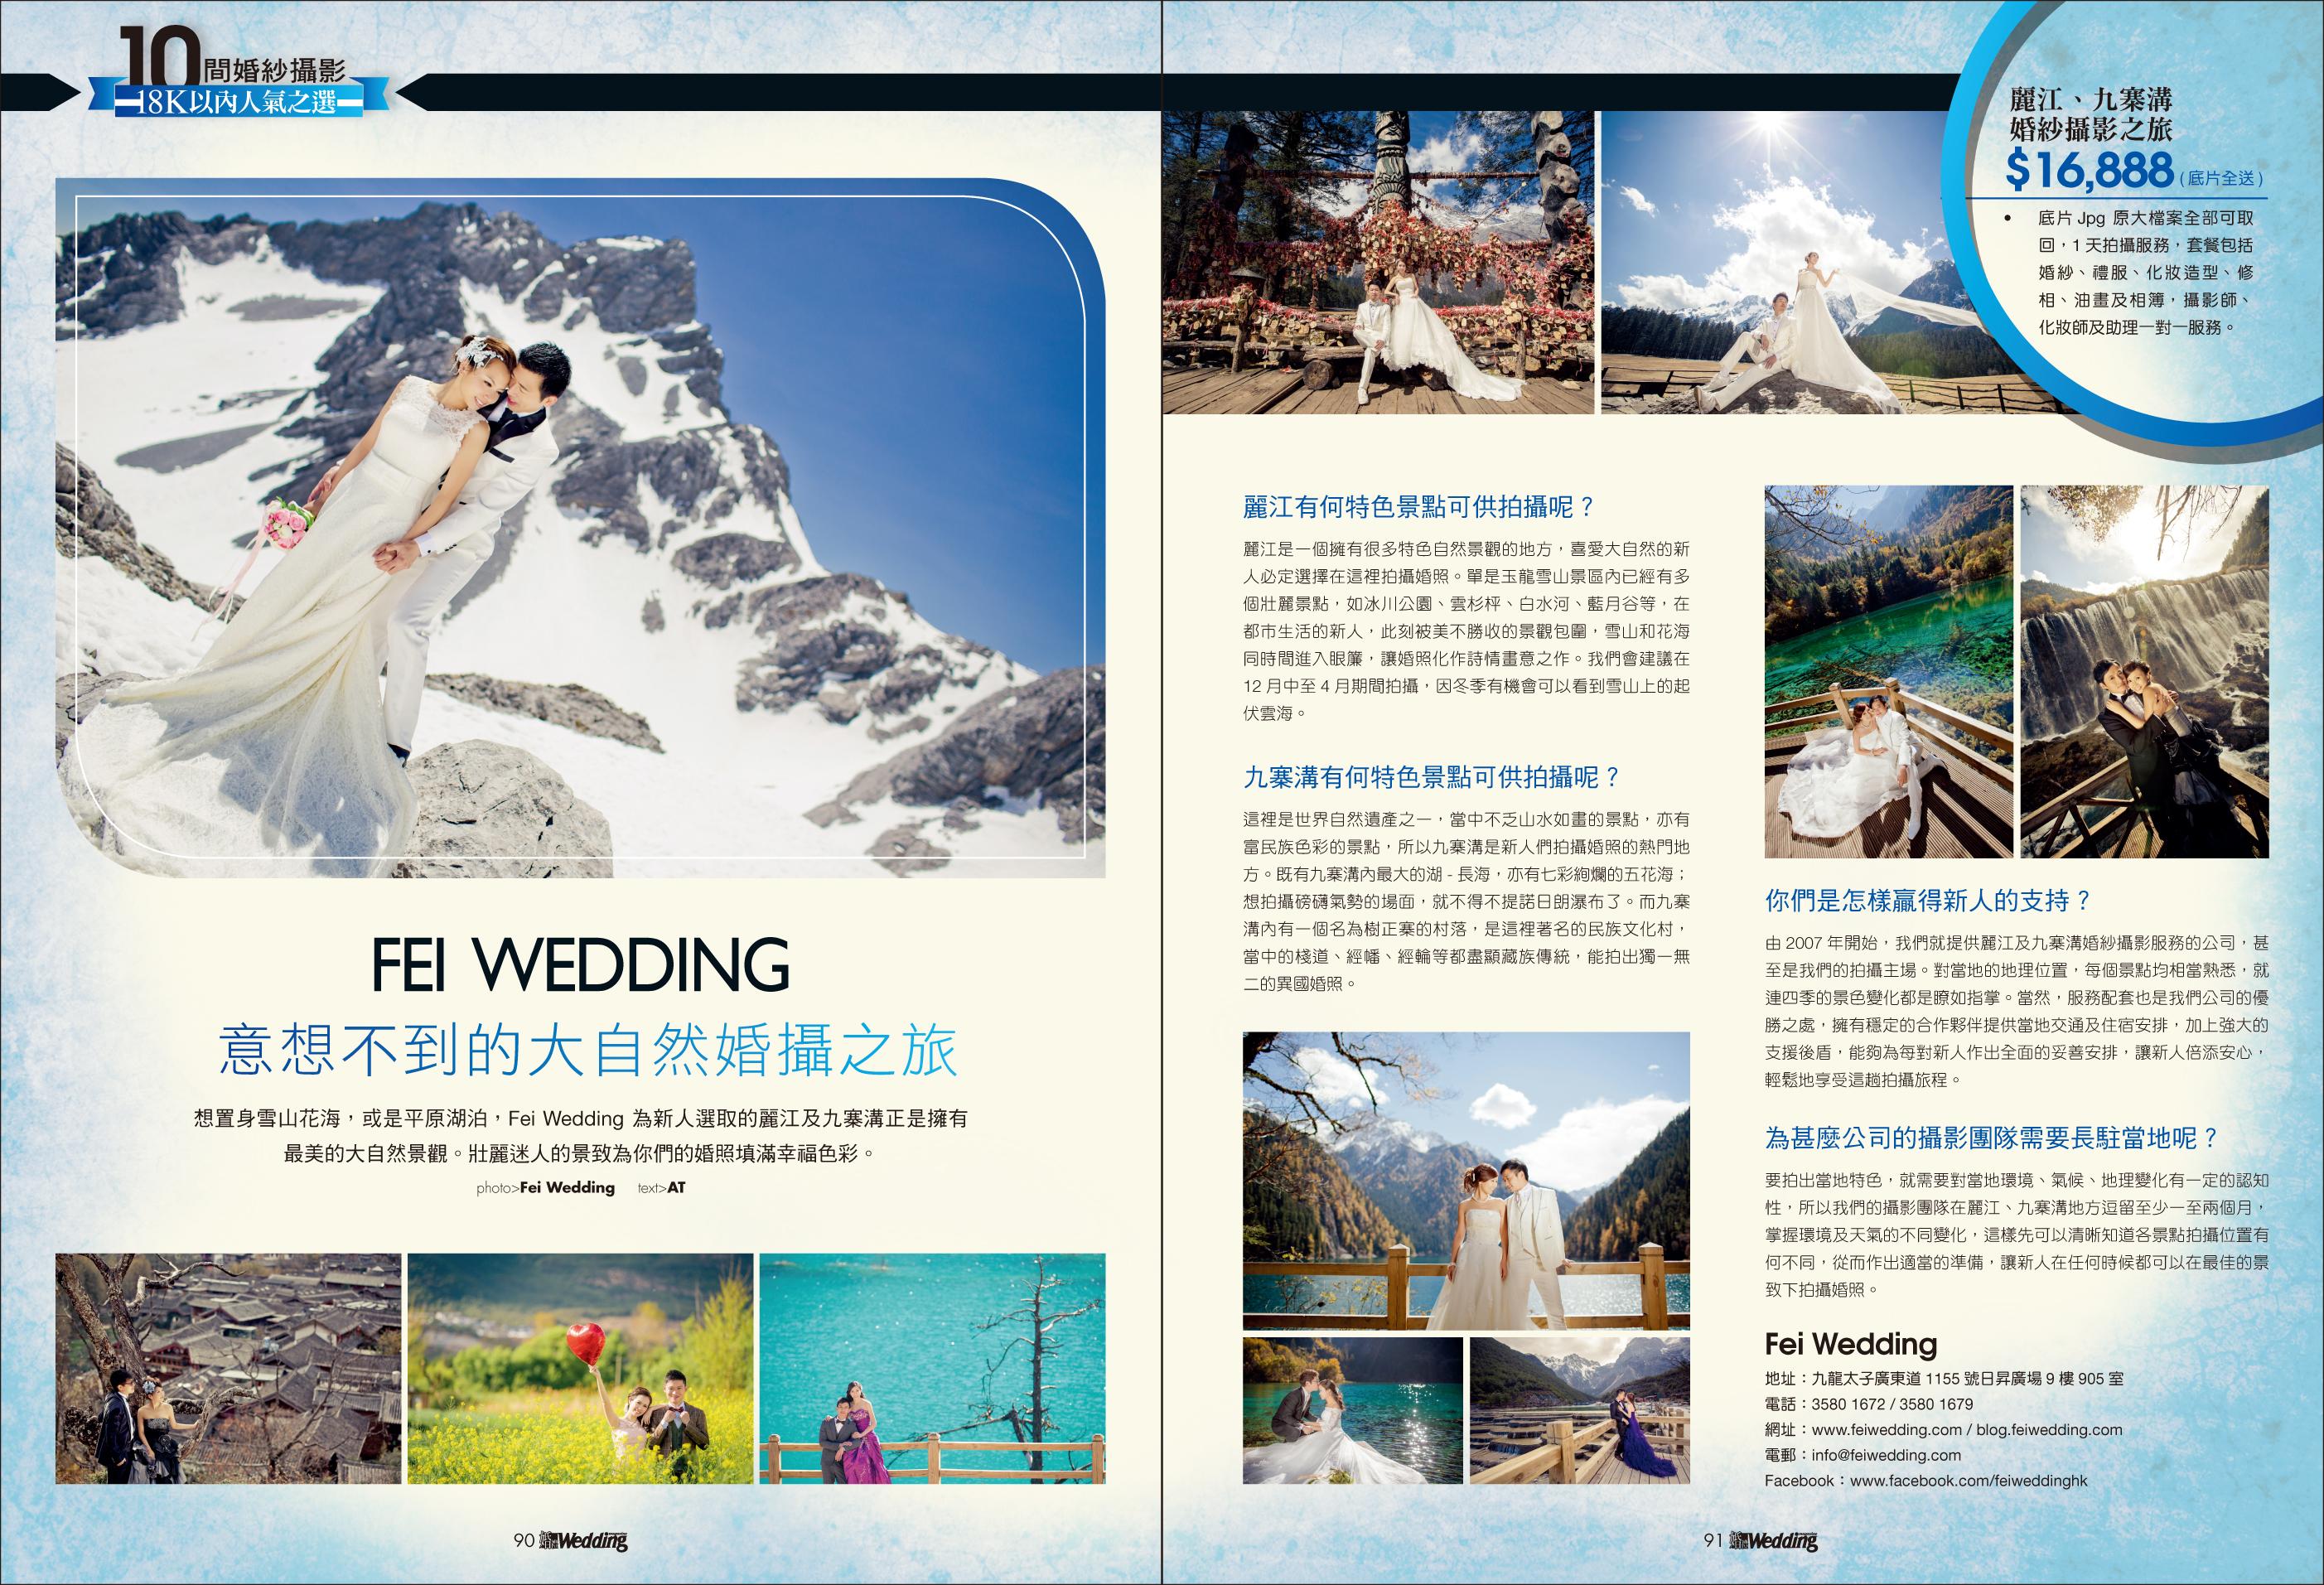 Fei Wedding